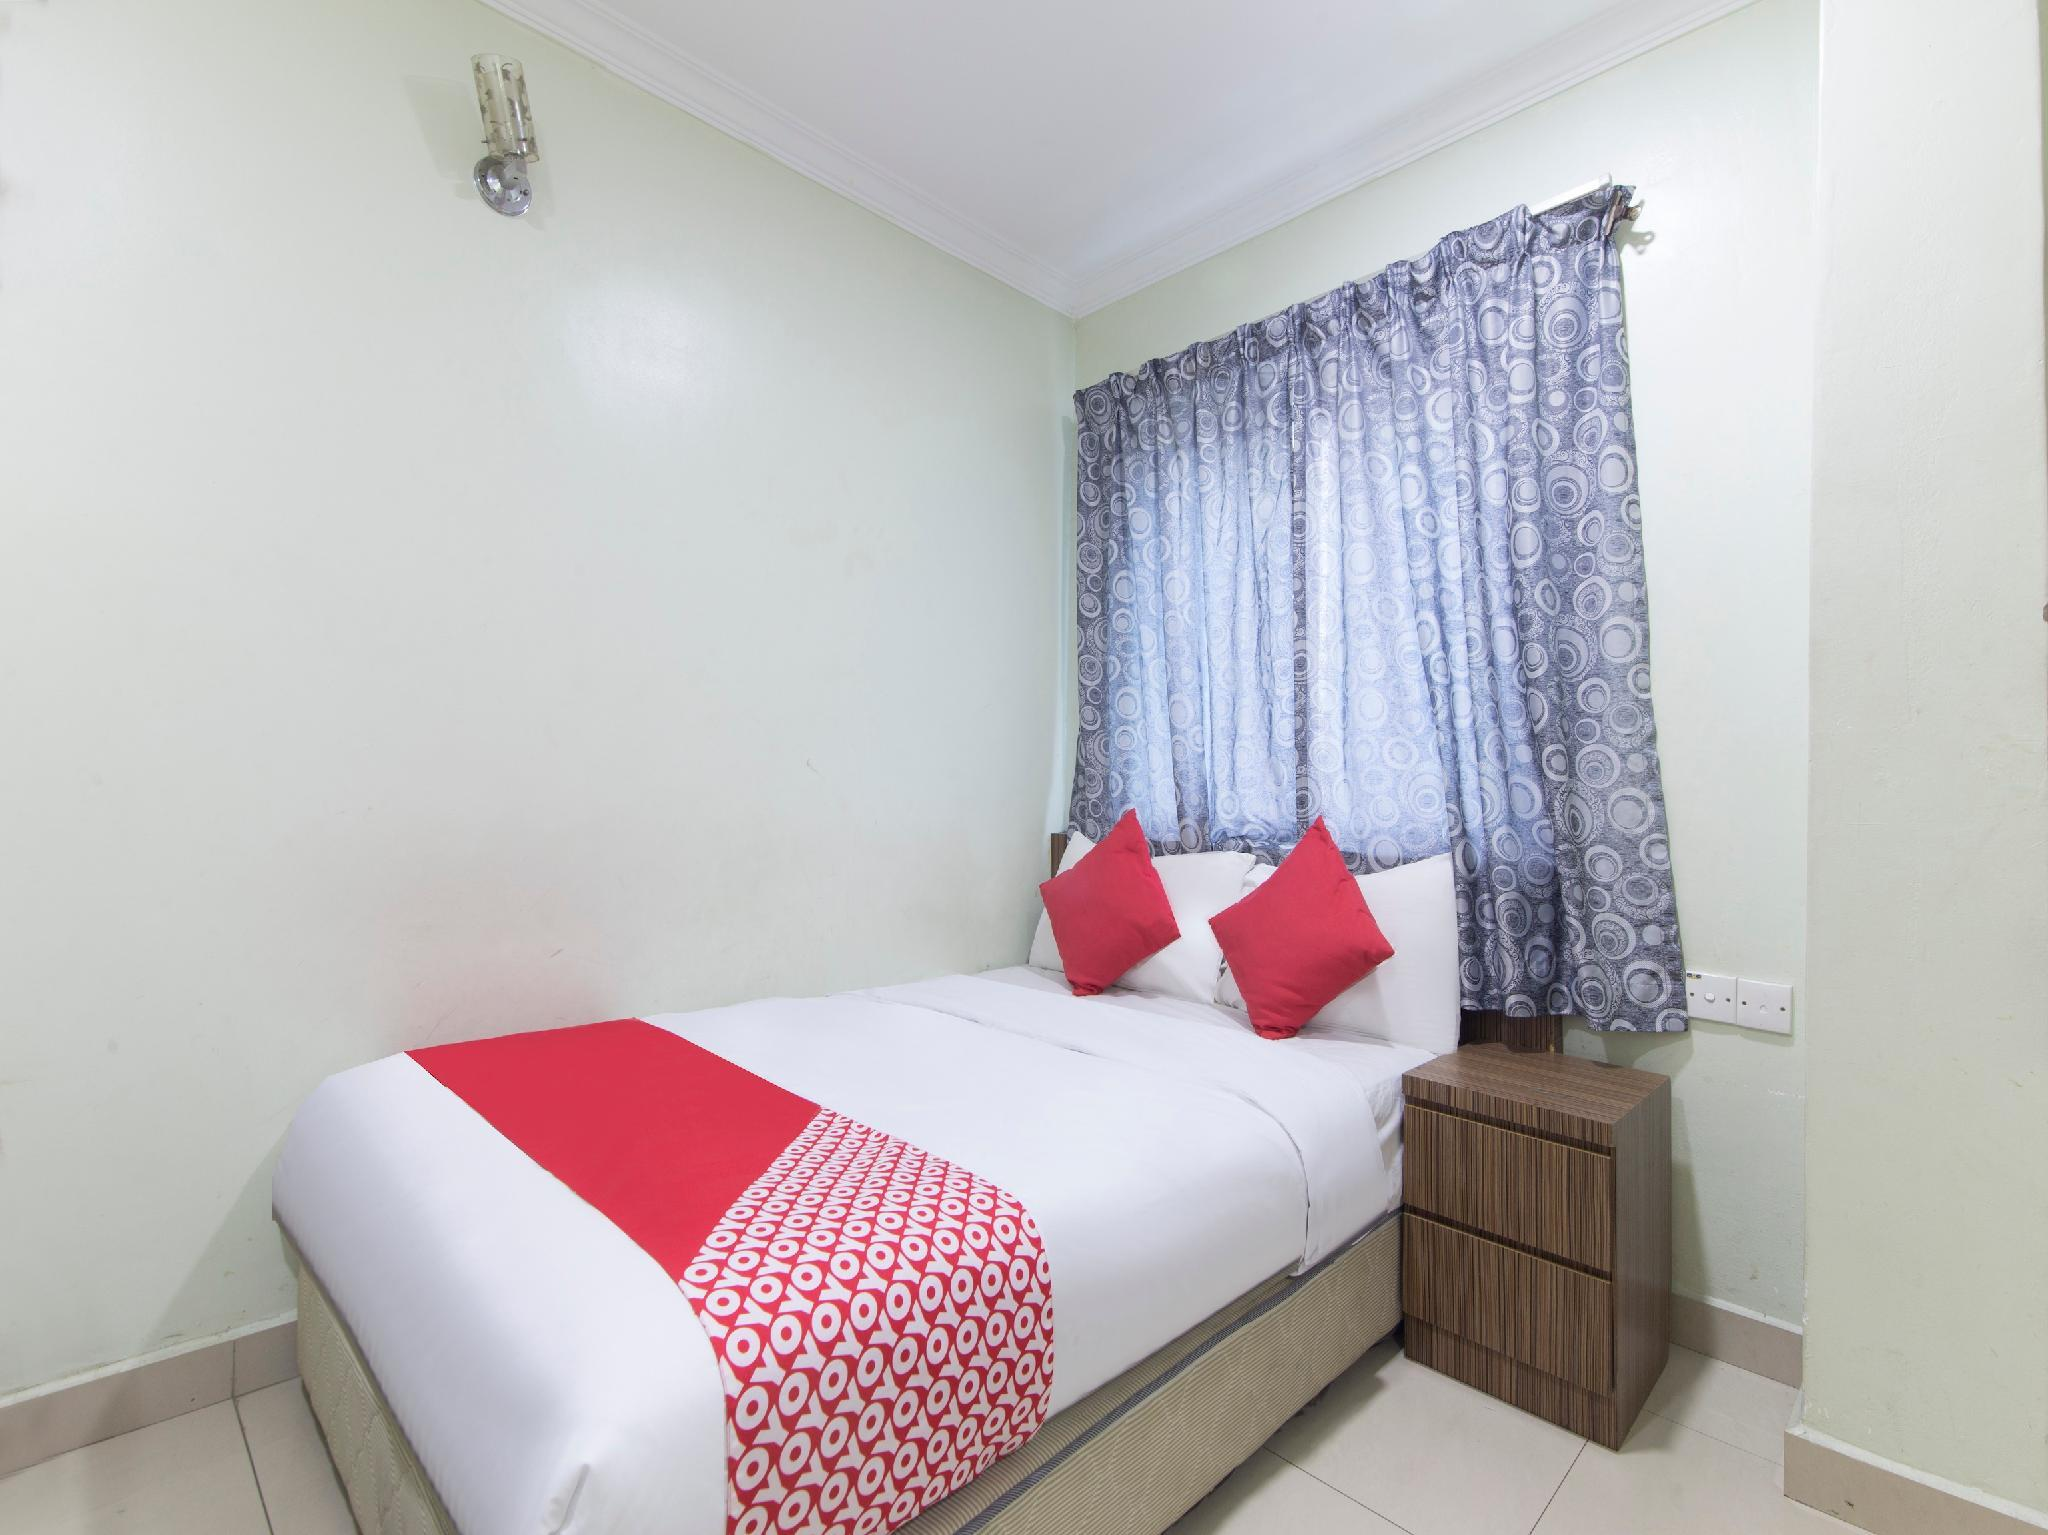 hotels near lrt train station wangsa maju kuala lumpur best rh agoda com